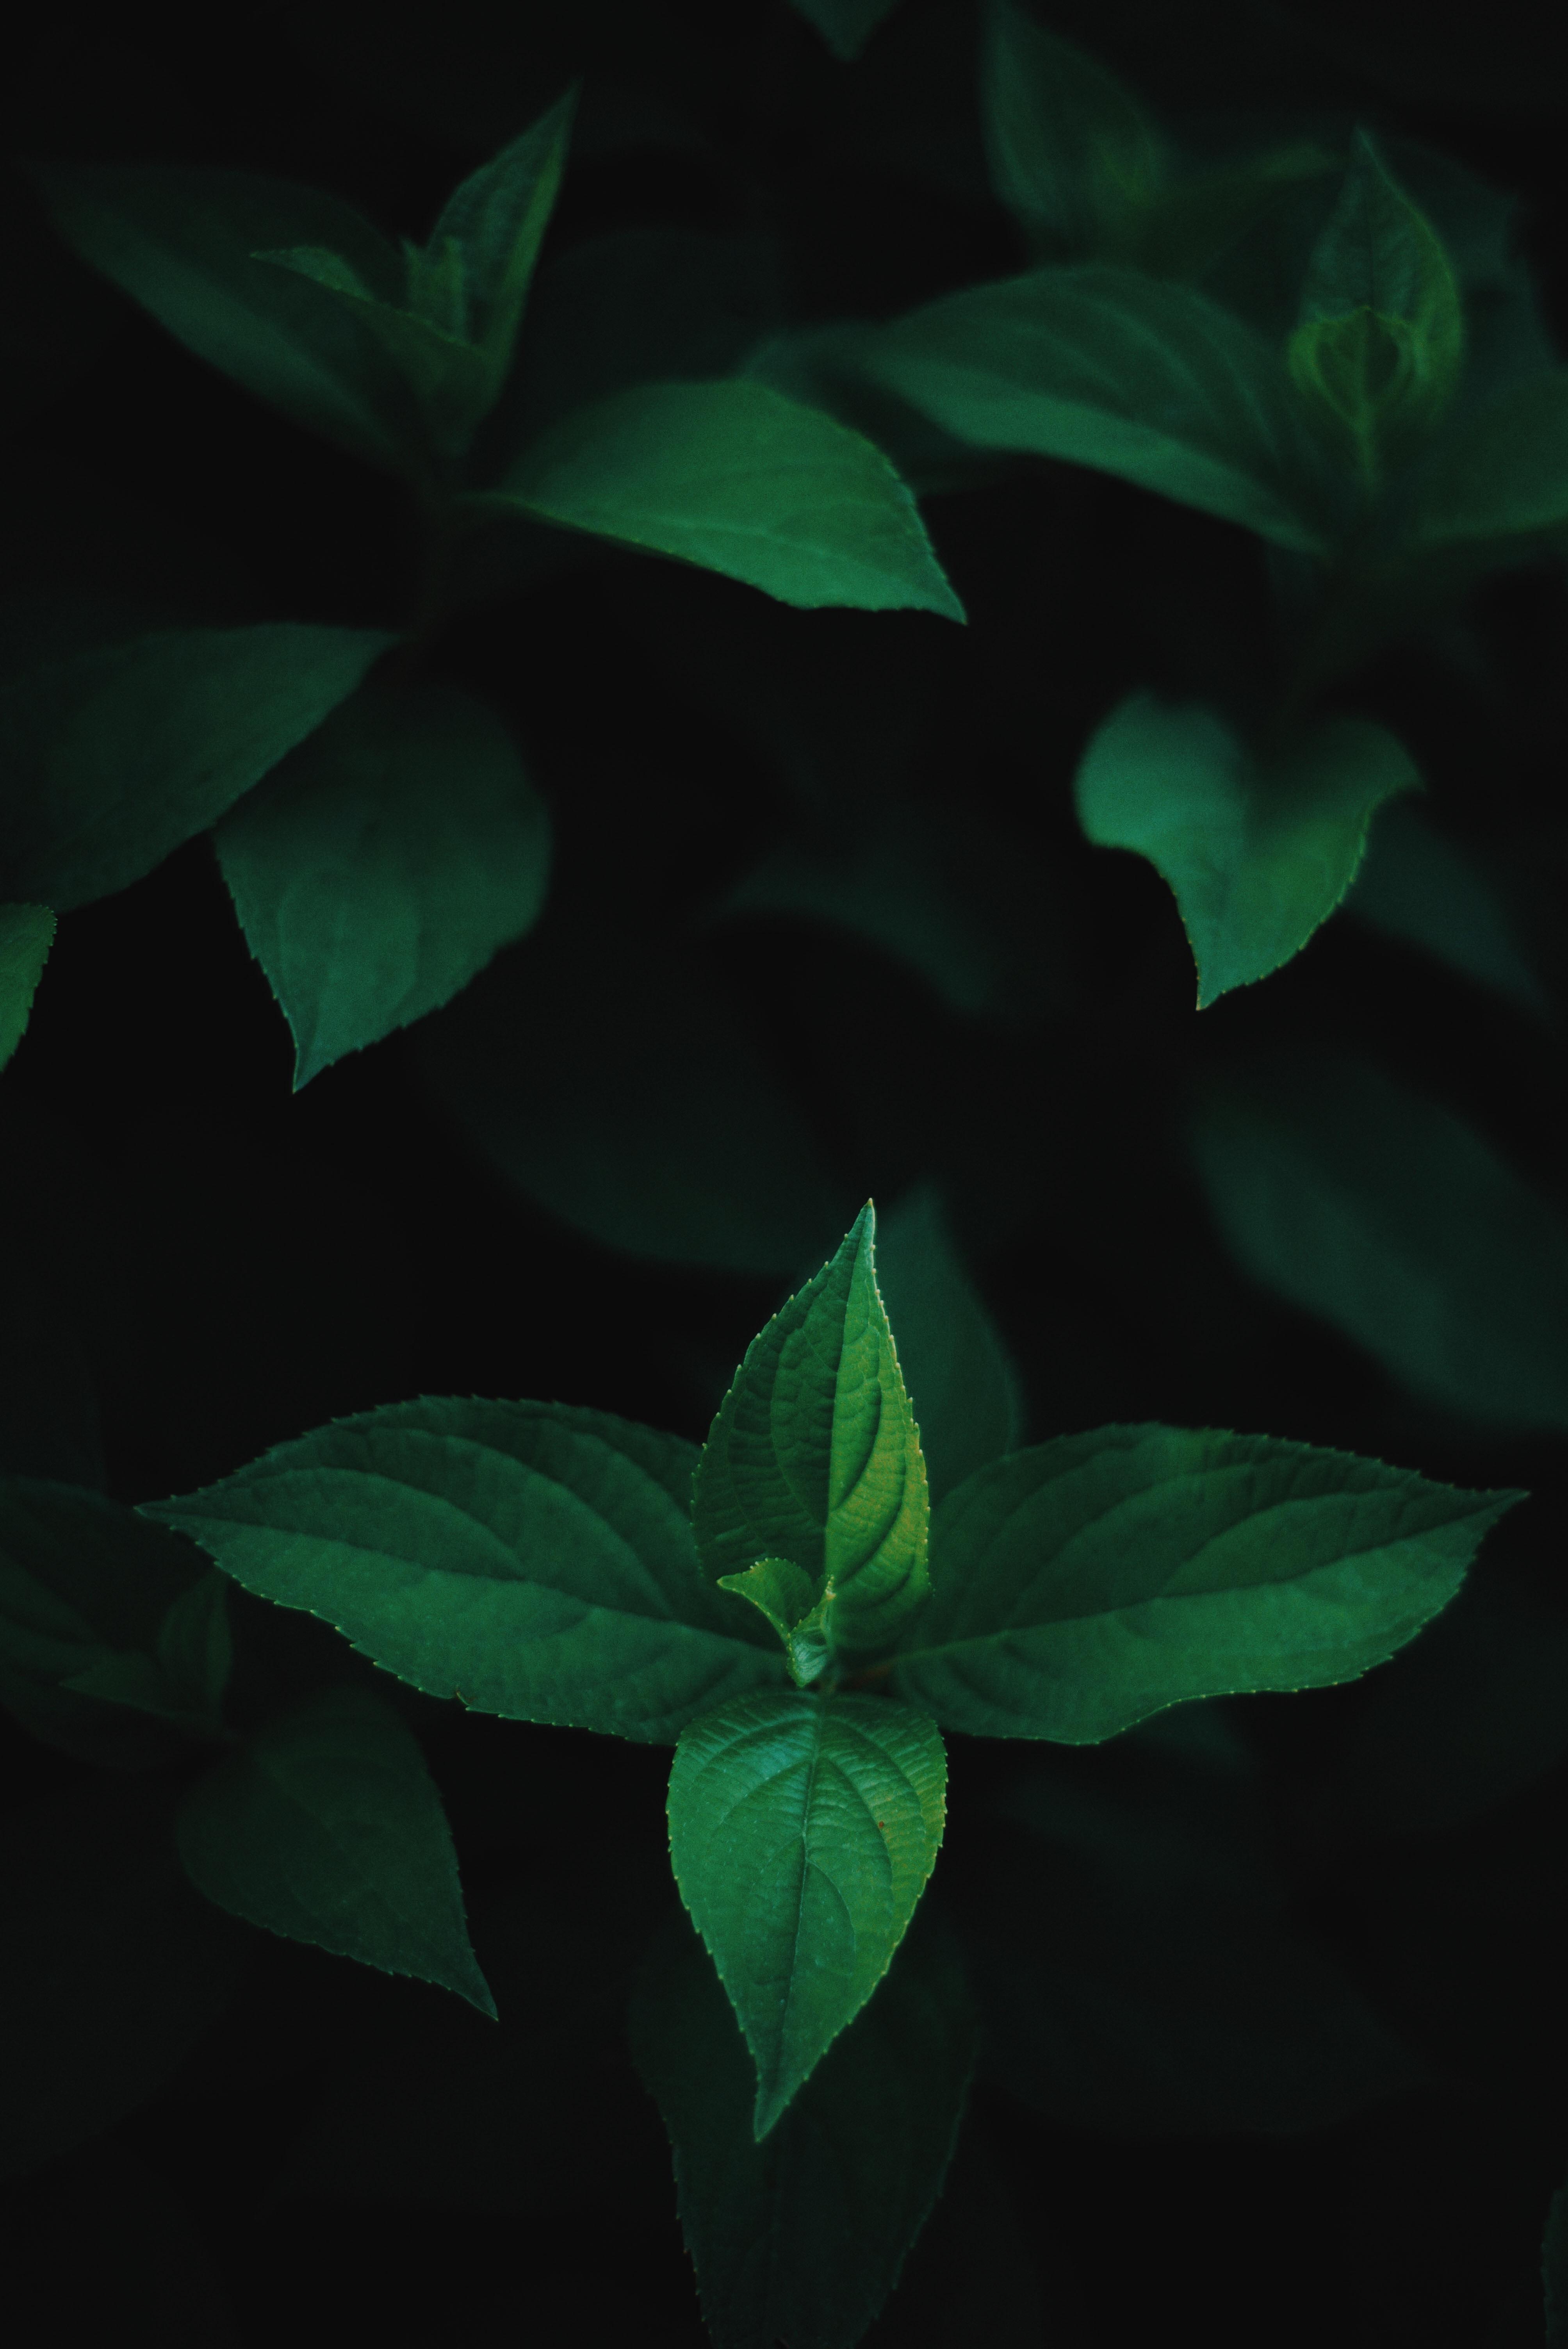 green mint on black background